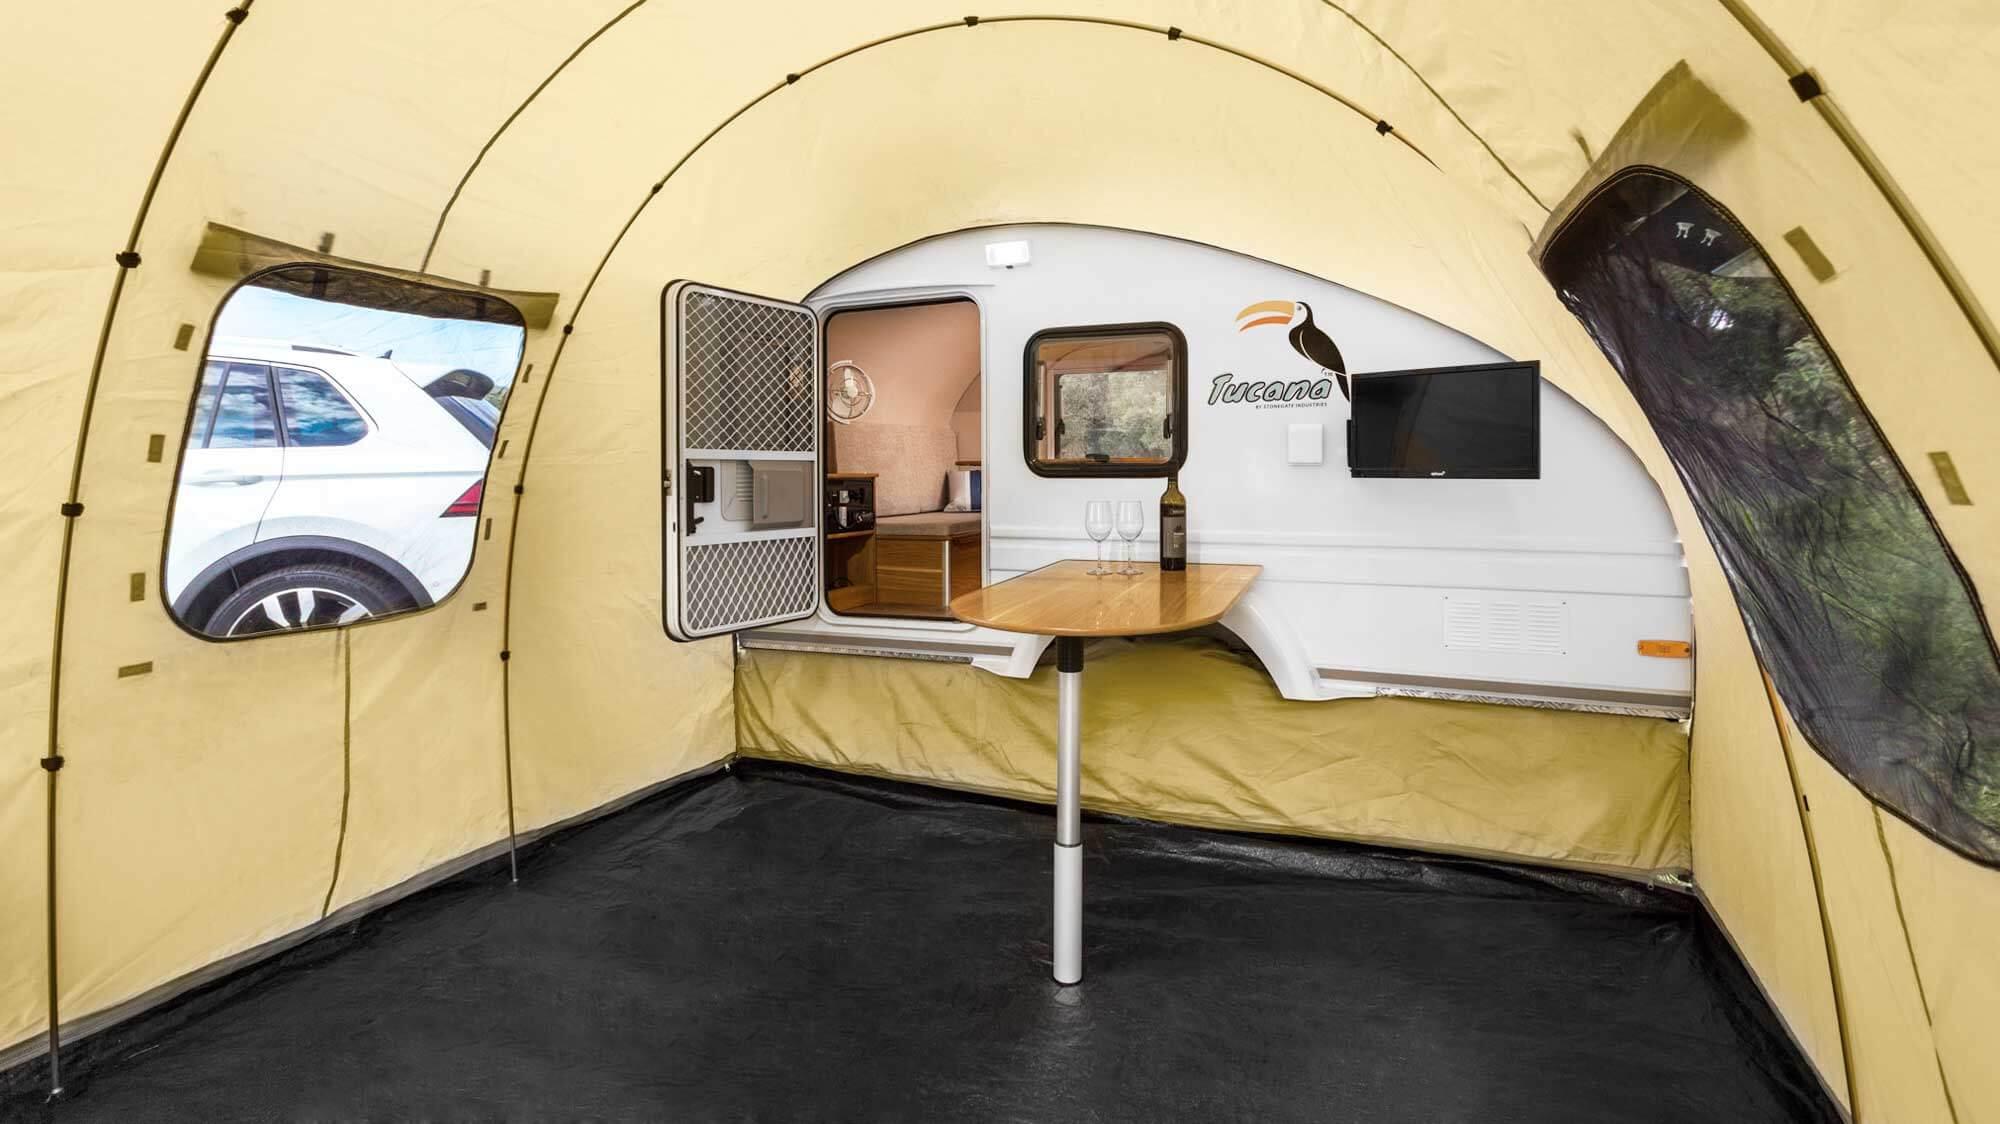 Tucana Teardrop Camper | Teardrop Camper for Sale ...